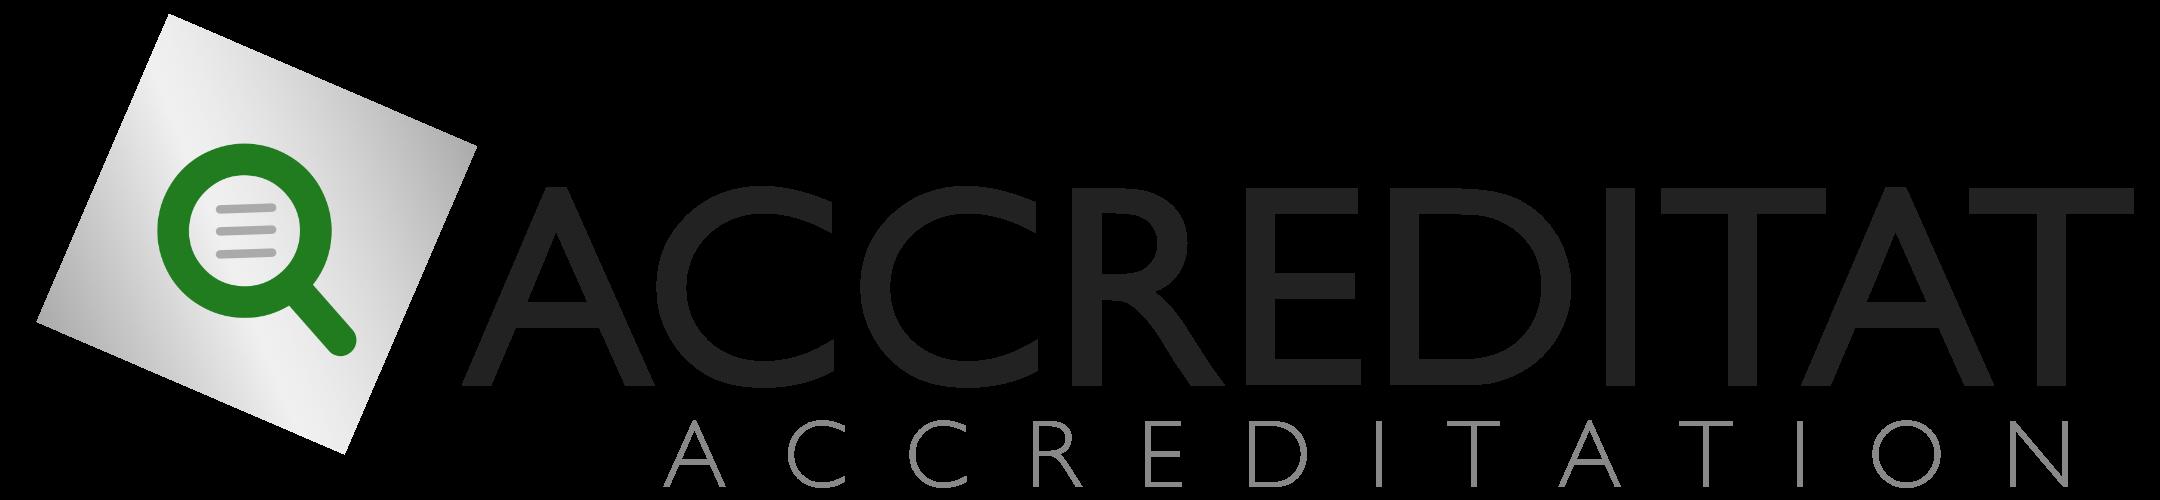 Accreditat accreditation TEFL